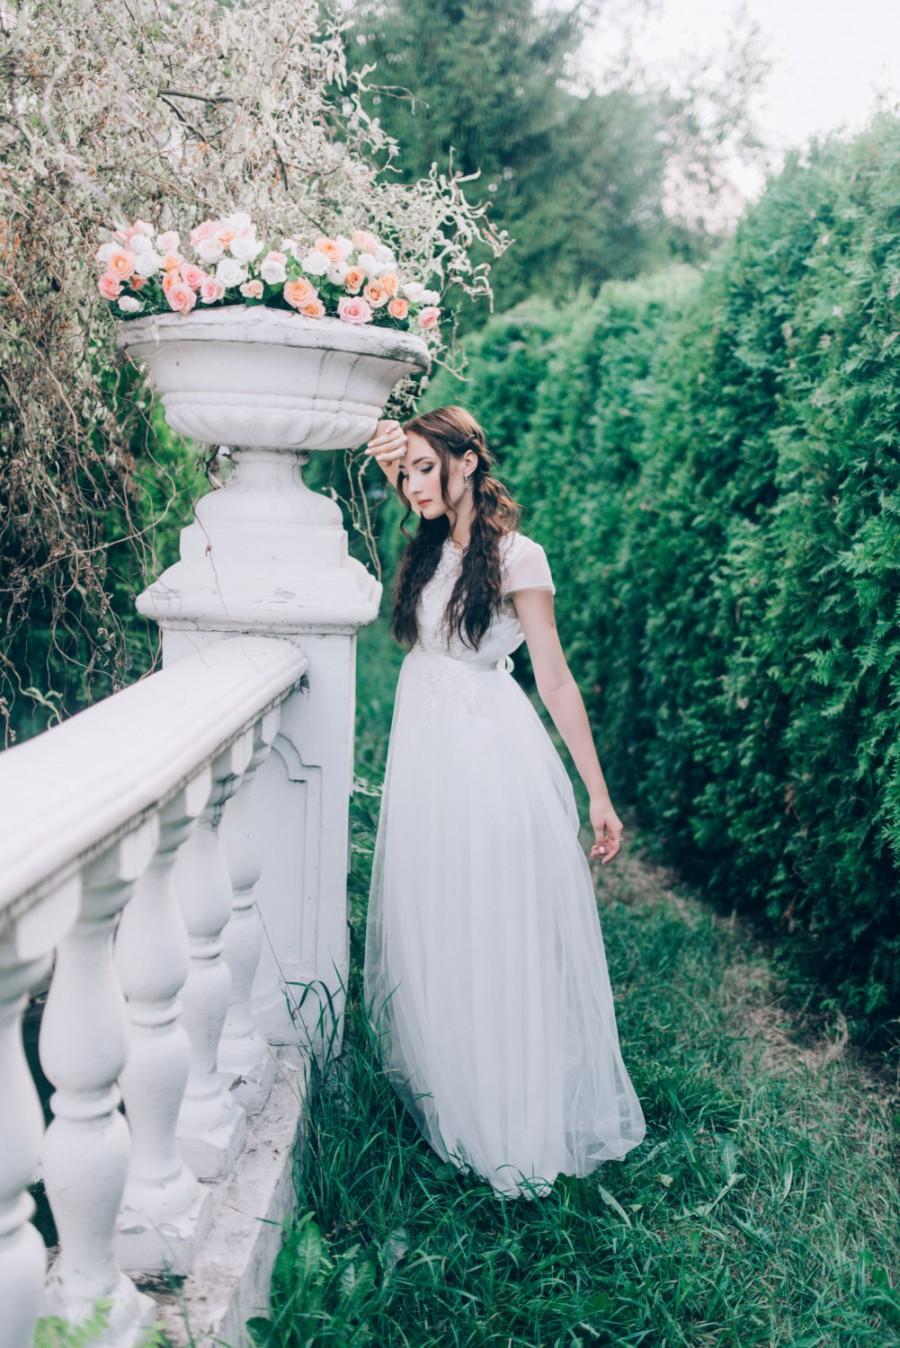 Hochzeit - Wedding lace dress - Angel -  unique wedding gown. Bridal gown. Bohemian wedding dress. Bridesmaid dress. Fairy wedding dress